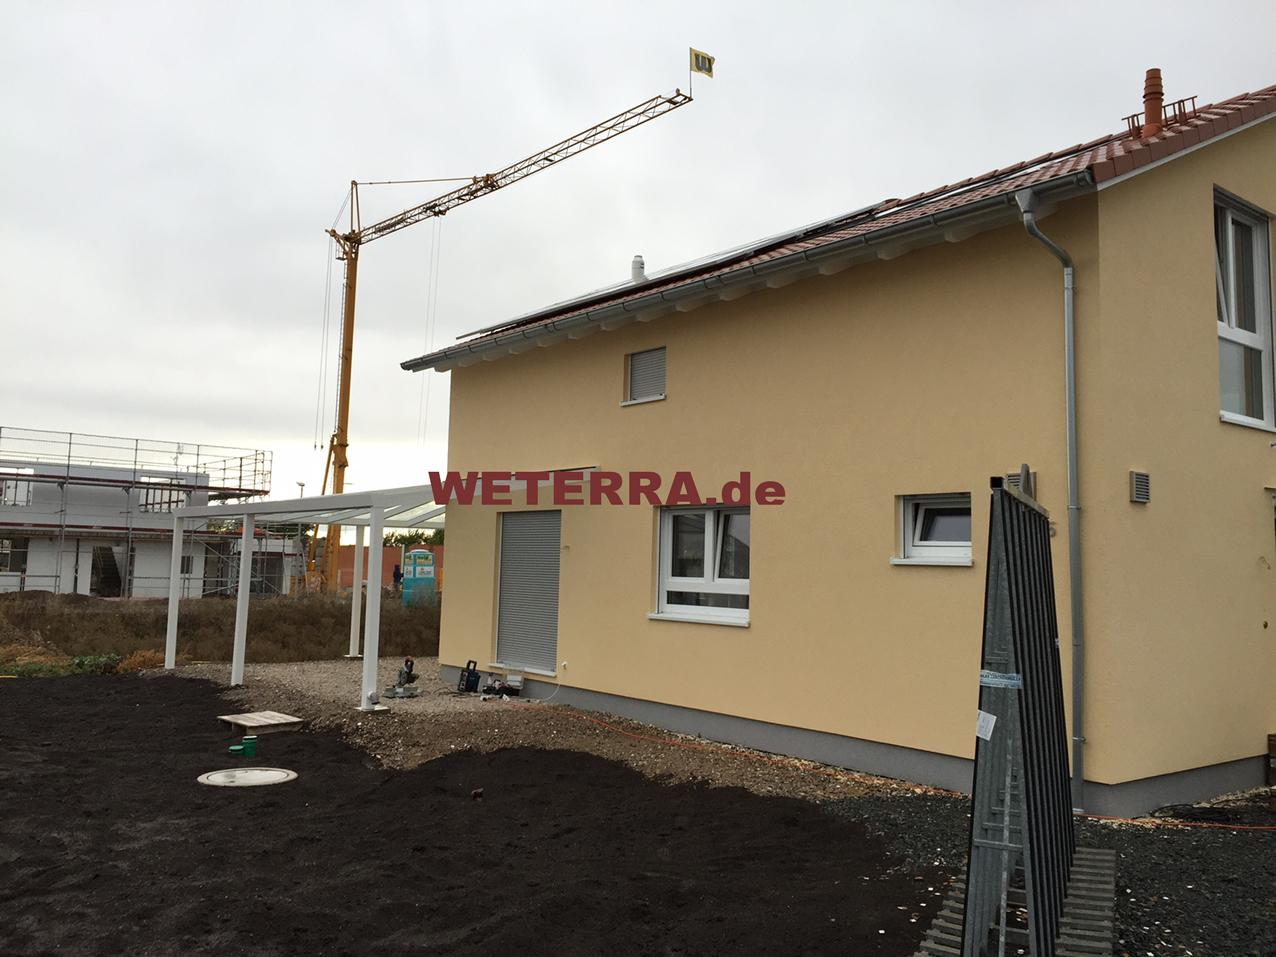 Holz TerrassenUberdachung Fulda ~ Terrassenüberdachung Mit Faltdach Sintesi Autoportante Frama Acti